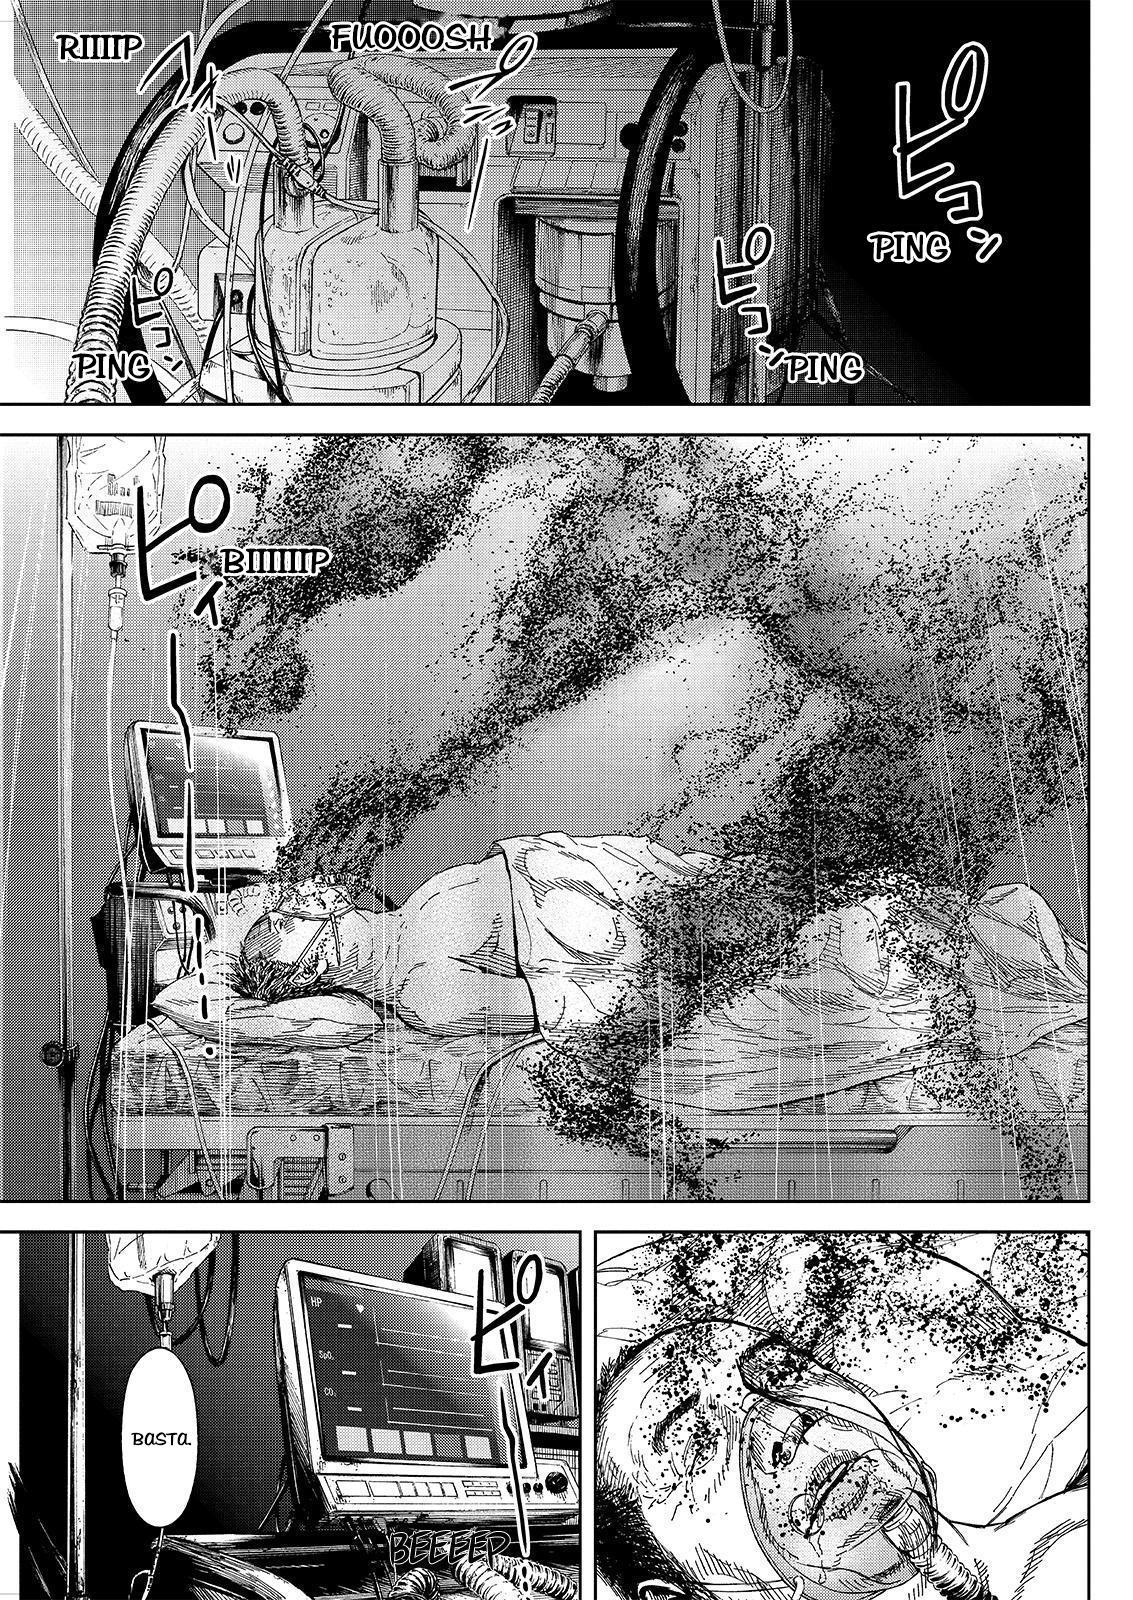 http://c5.ninemanga.com/es_manga/54/16310/423644/3ad9b2048e580655c901c44e06d9dd69.jpg Page 6